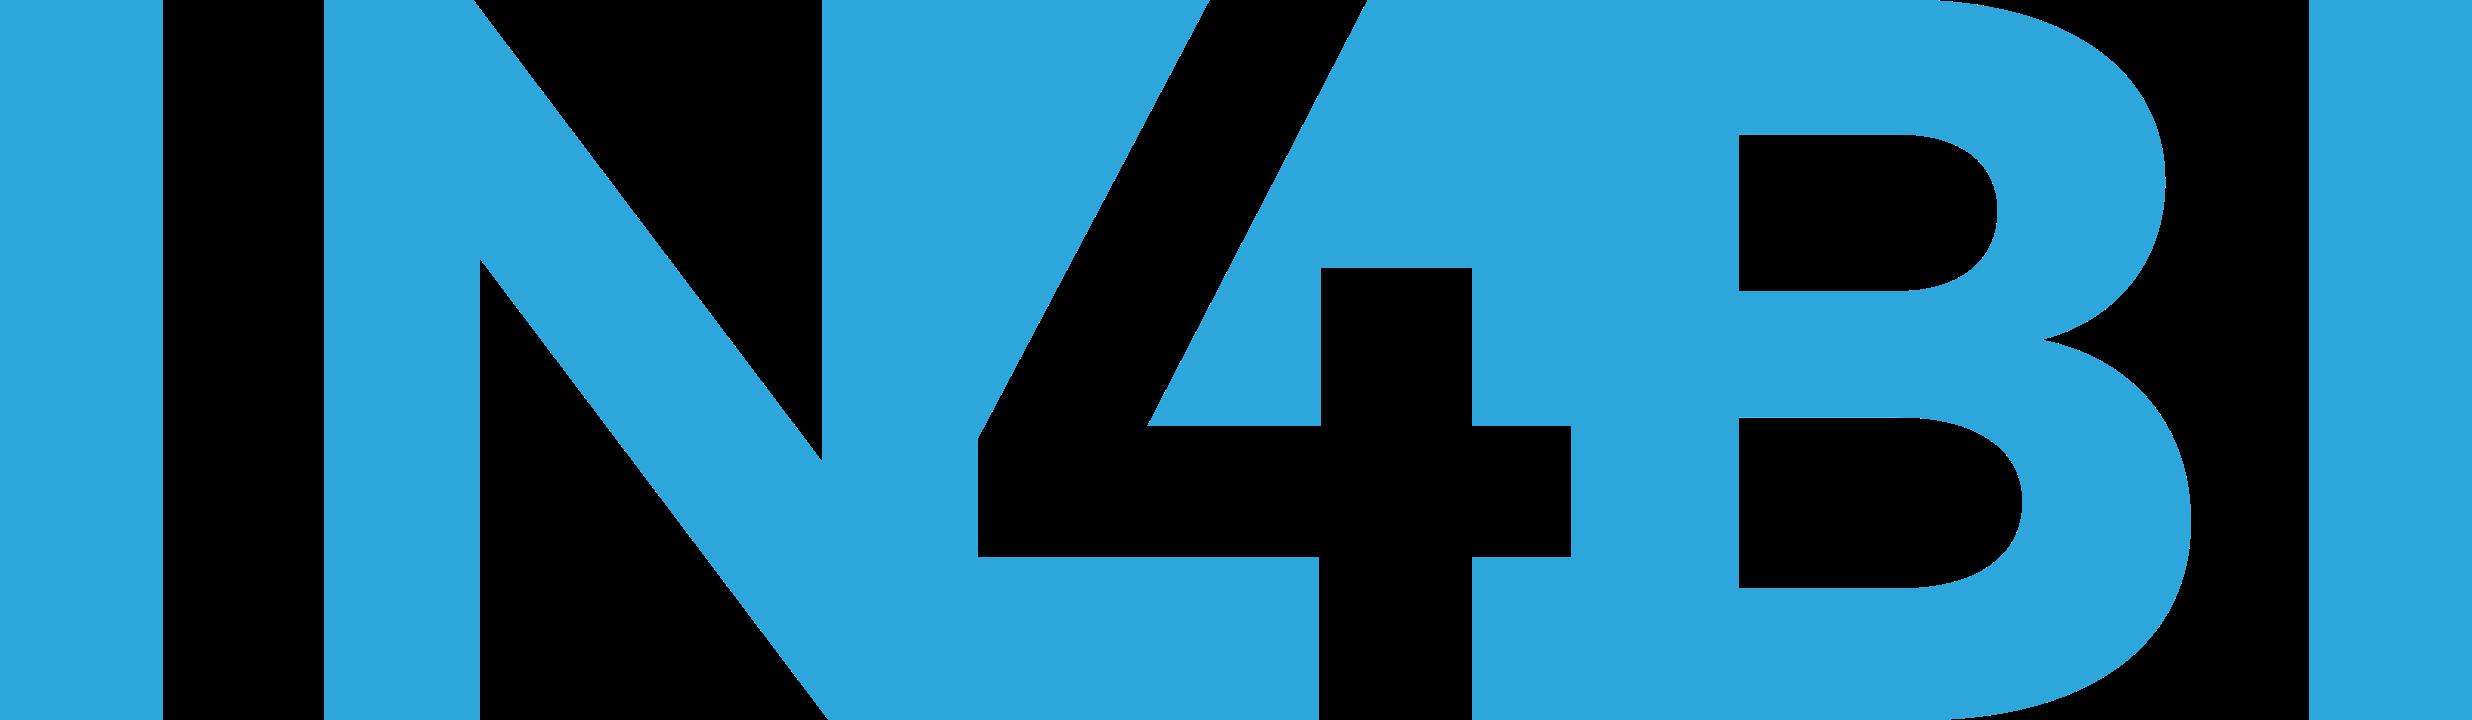 in4bi-logo-blue-single